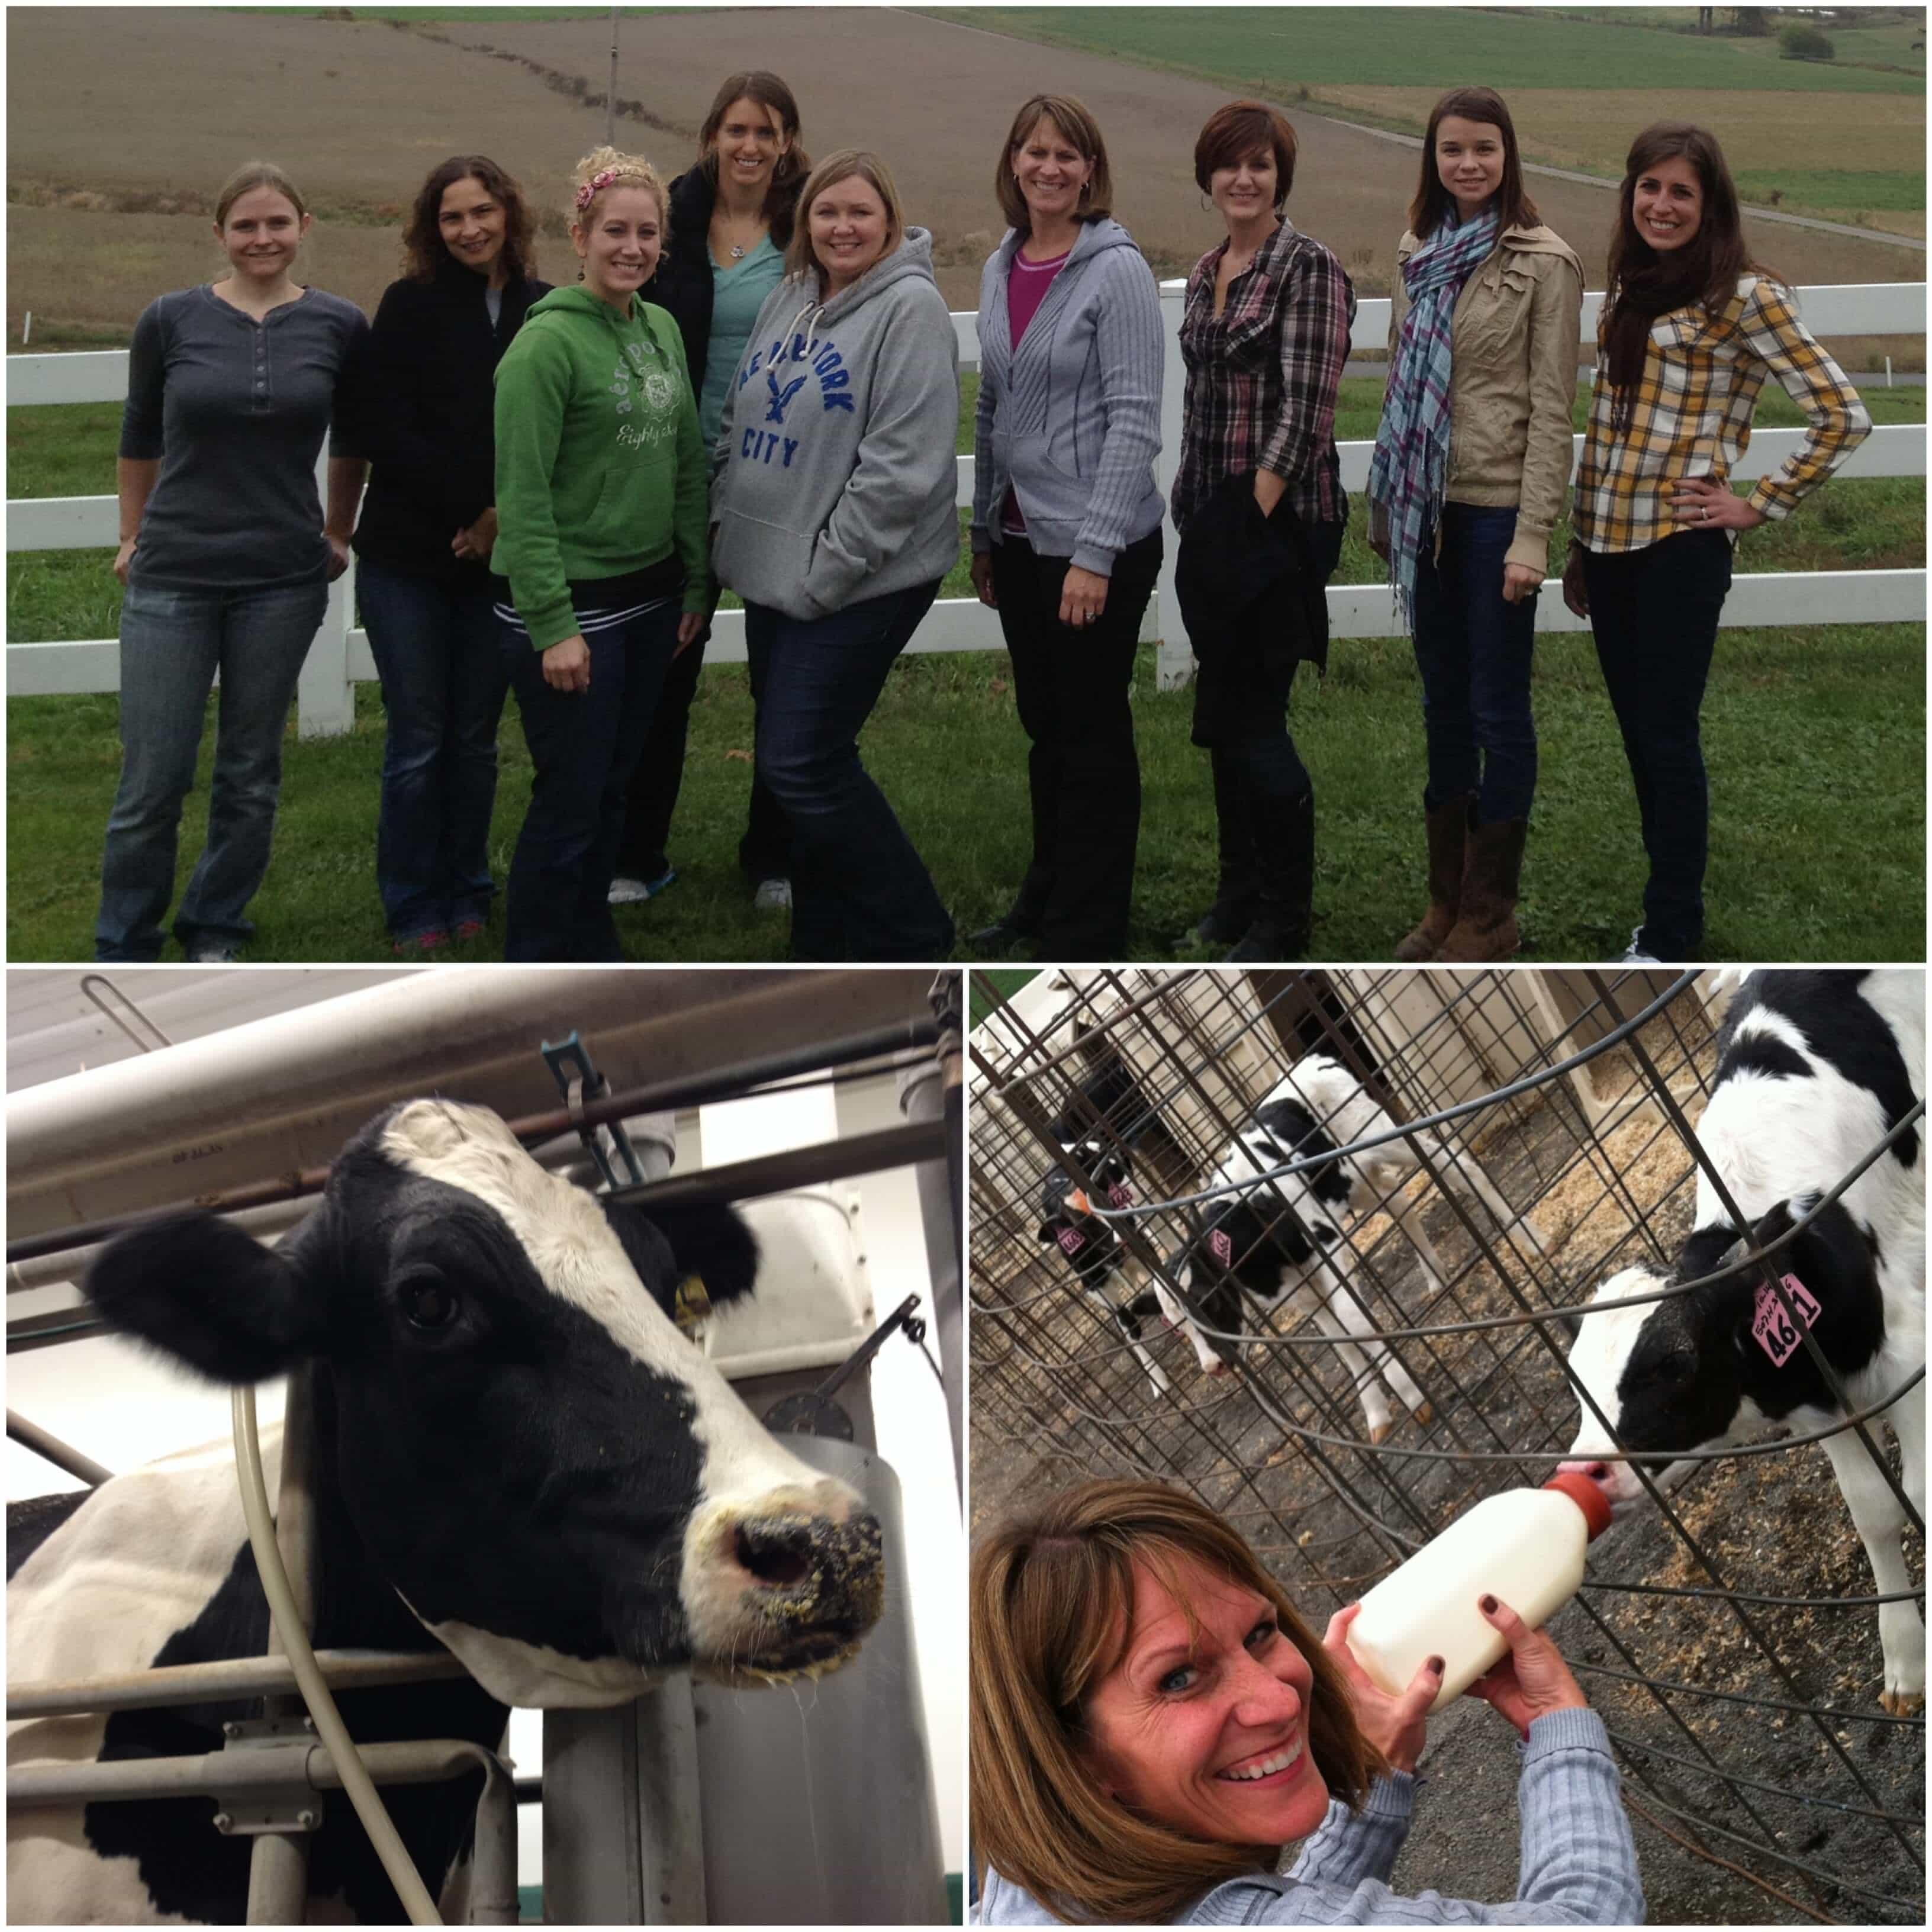 Extraordin-Dairy Adventure